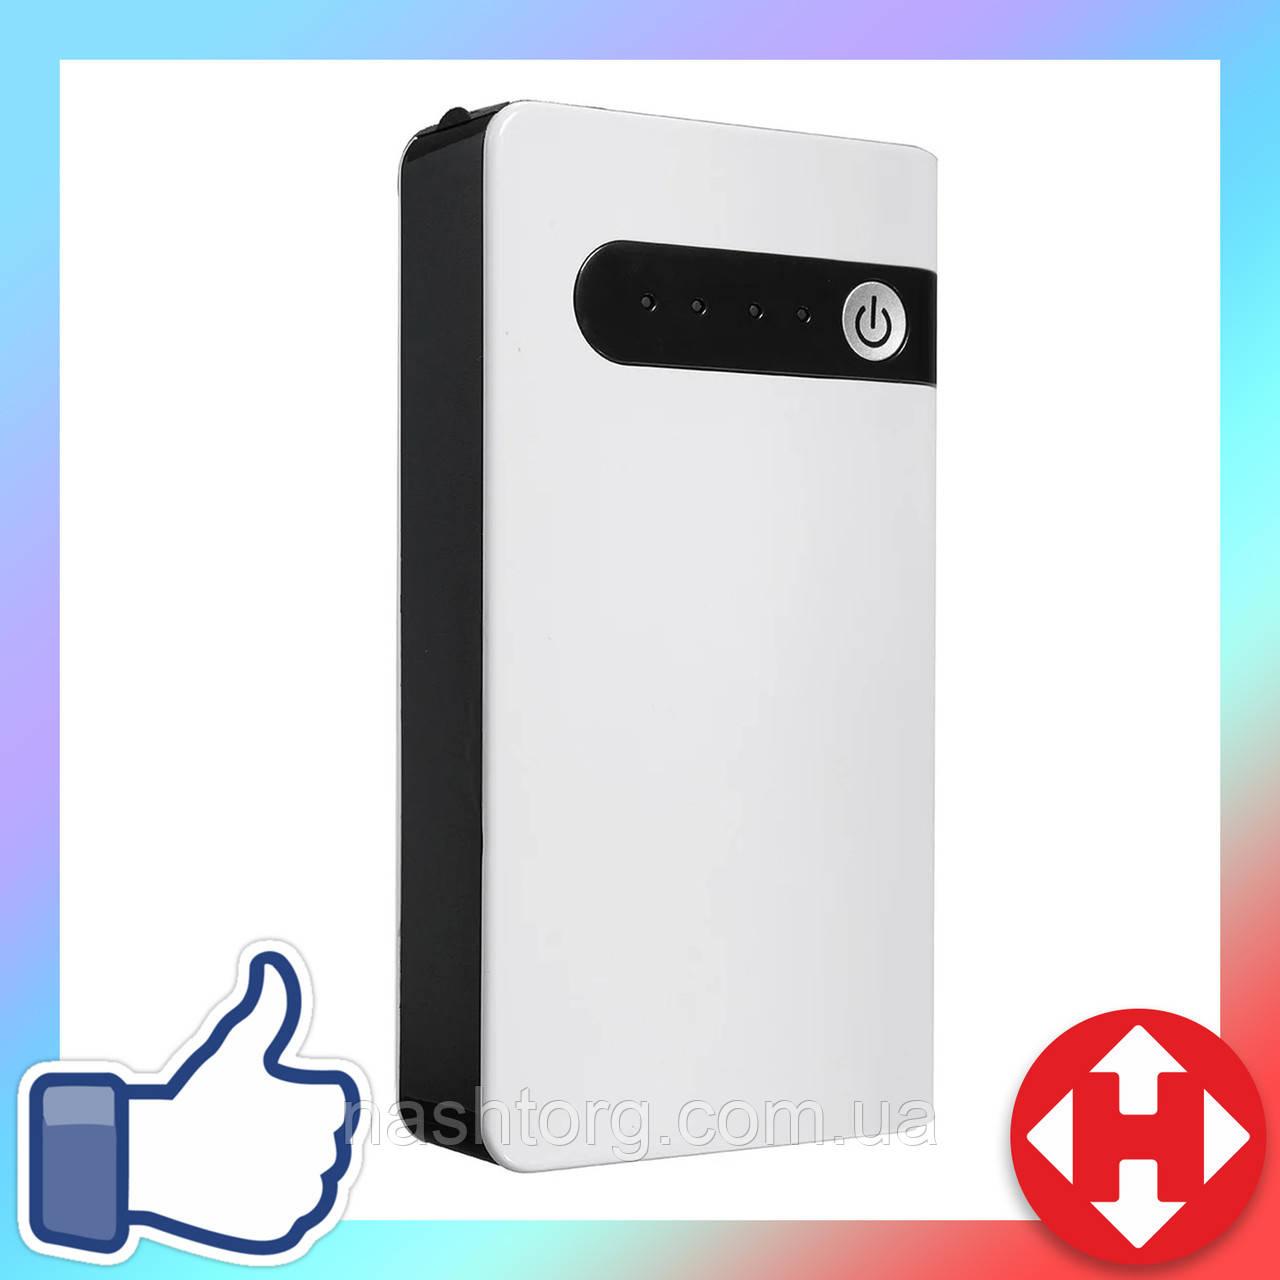 Пуско-зарядное устройство 12000 mAh Starting Power Bank (White) повербанк портативное пусковое для автомобиля